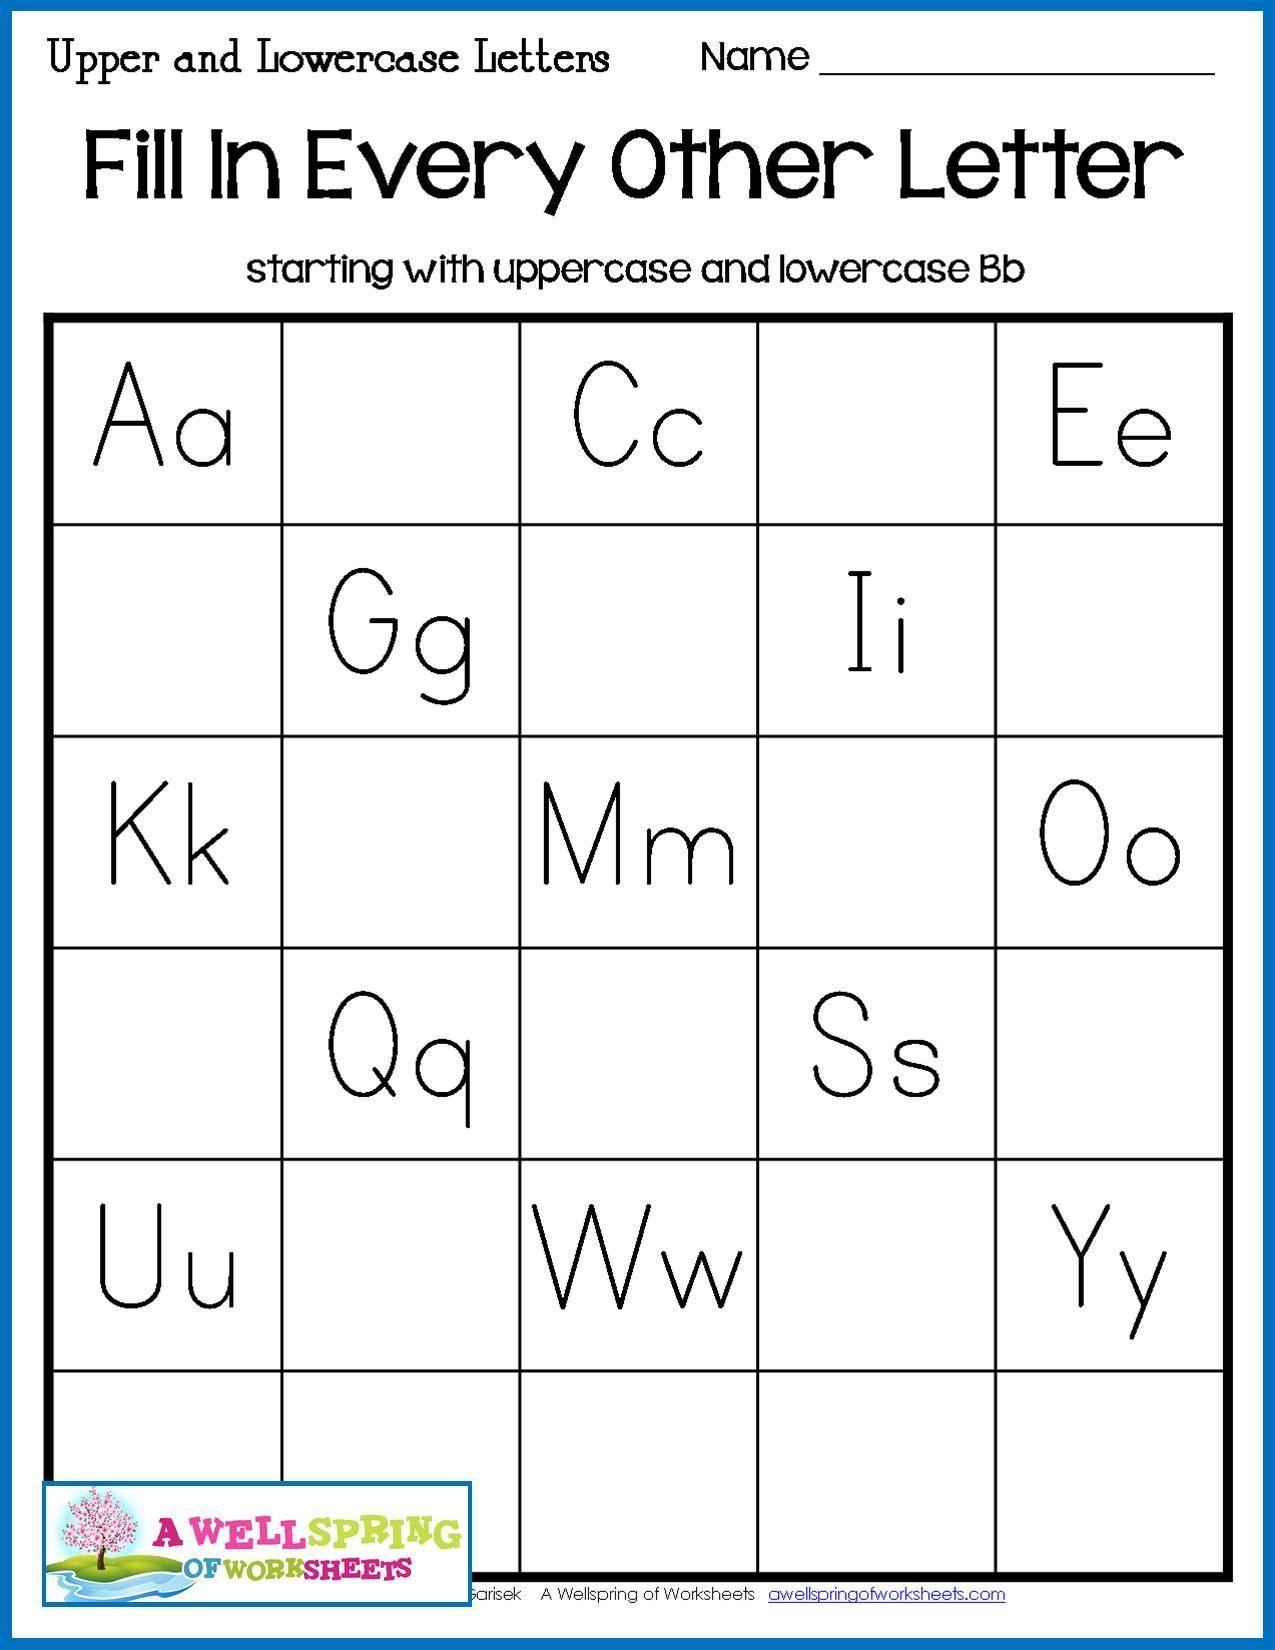 10 Missing Letters Worksheet In